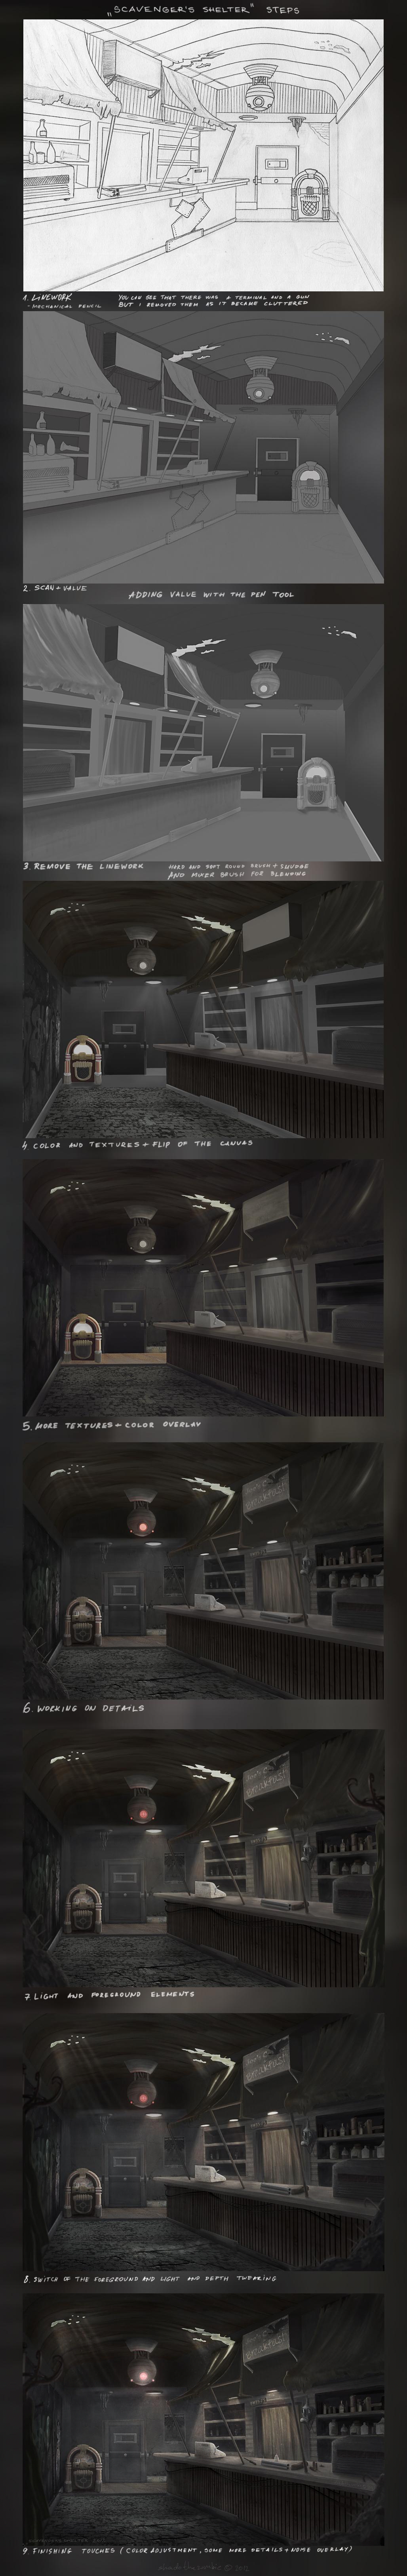 Scavenger's Shelter - STEPS by nikolayhranov